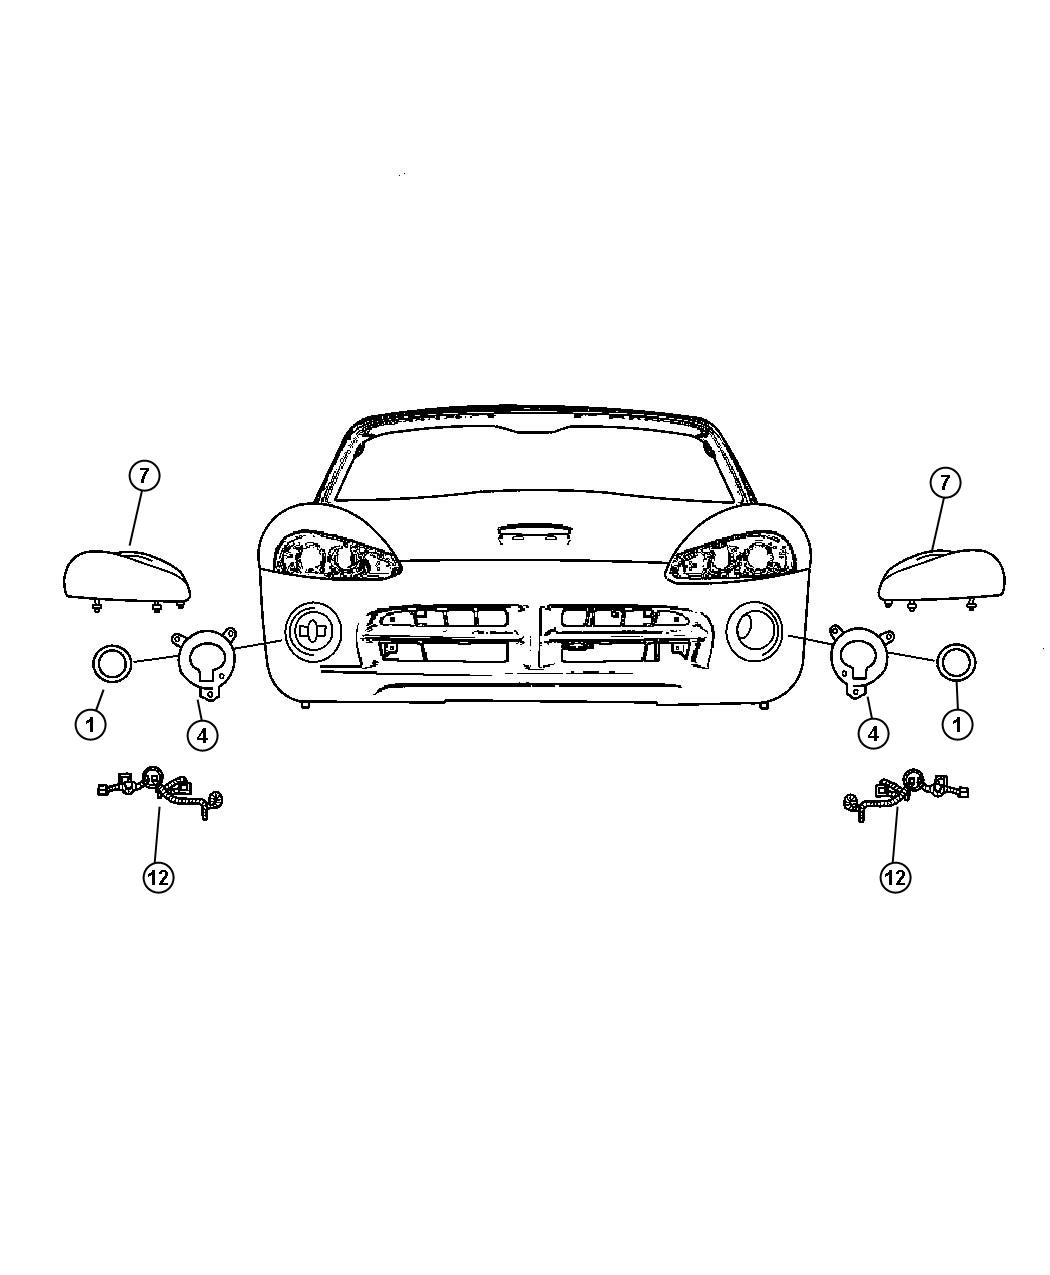 Dodge Viper Panel. Fog lamp. Front, fender, lamps